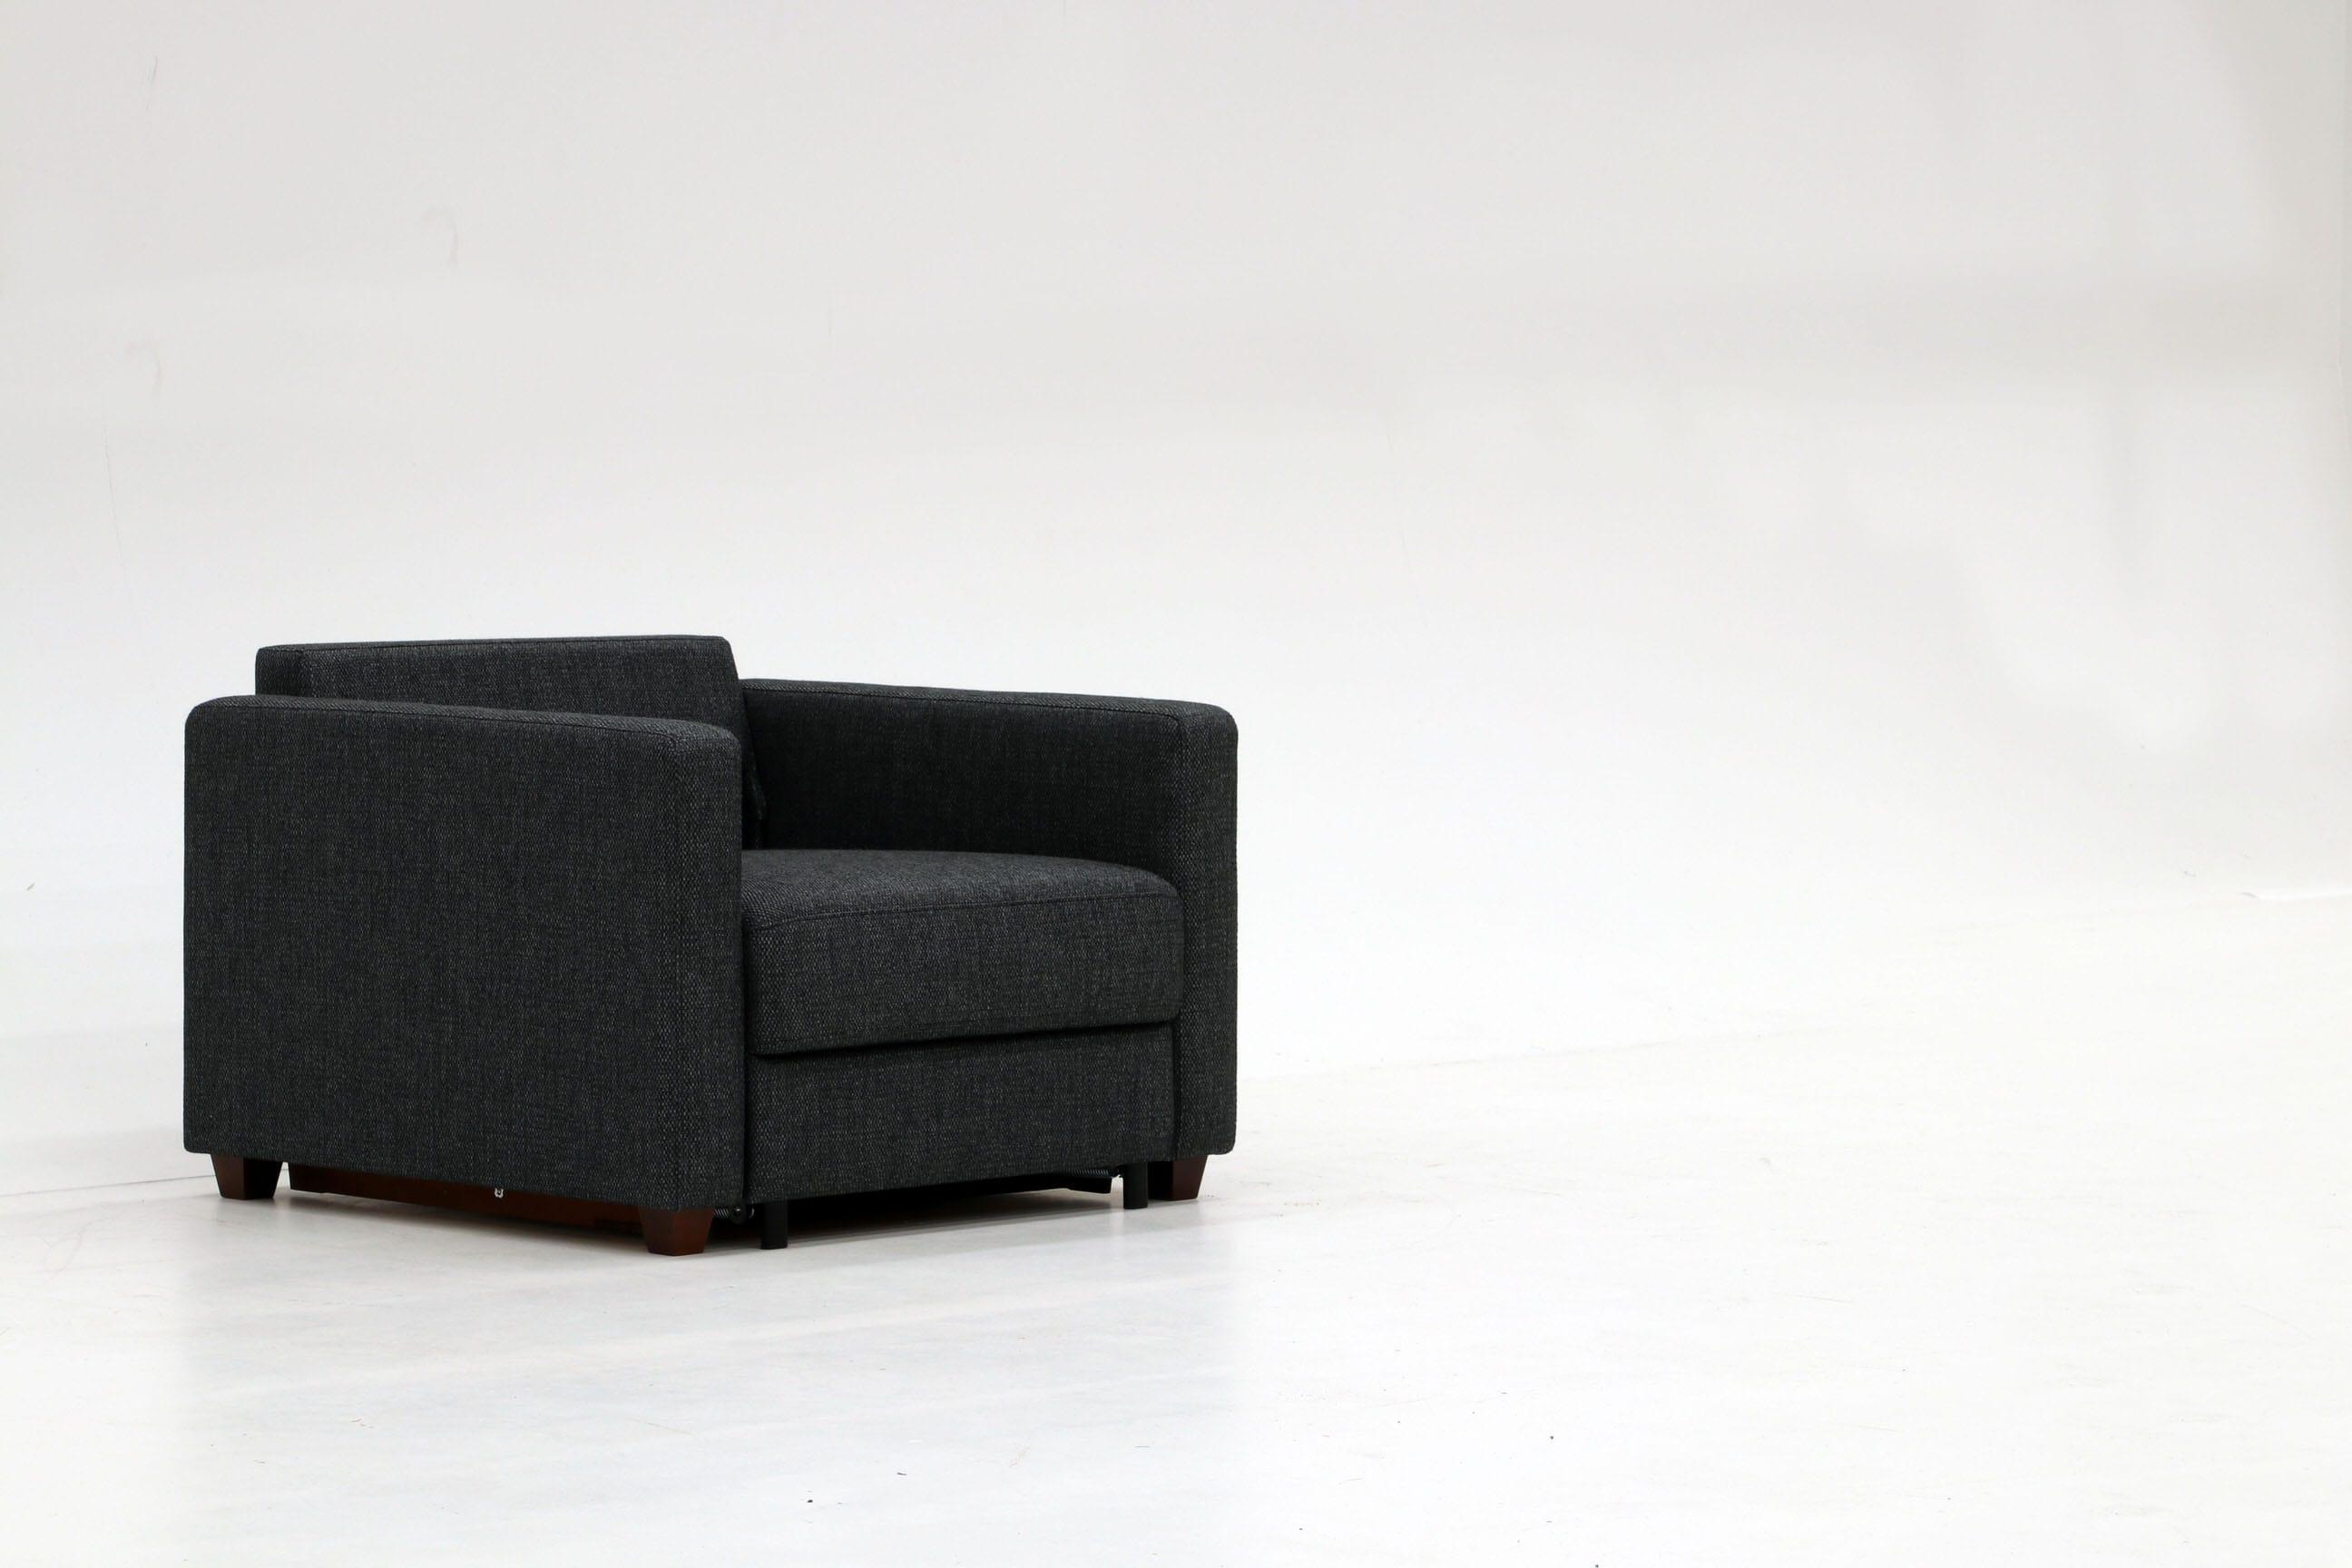 Strange Fantasy Chair Sleeper Cot Size By Luonto Furniture Spiritservingveterans Wood Chair Design Ideas Spiritservingveteransorg